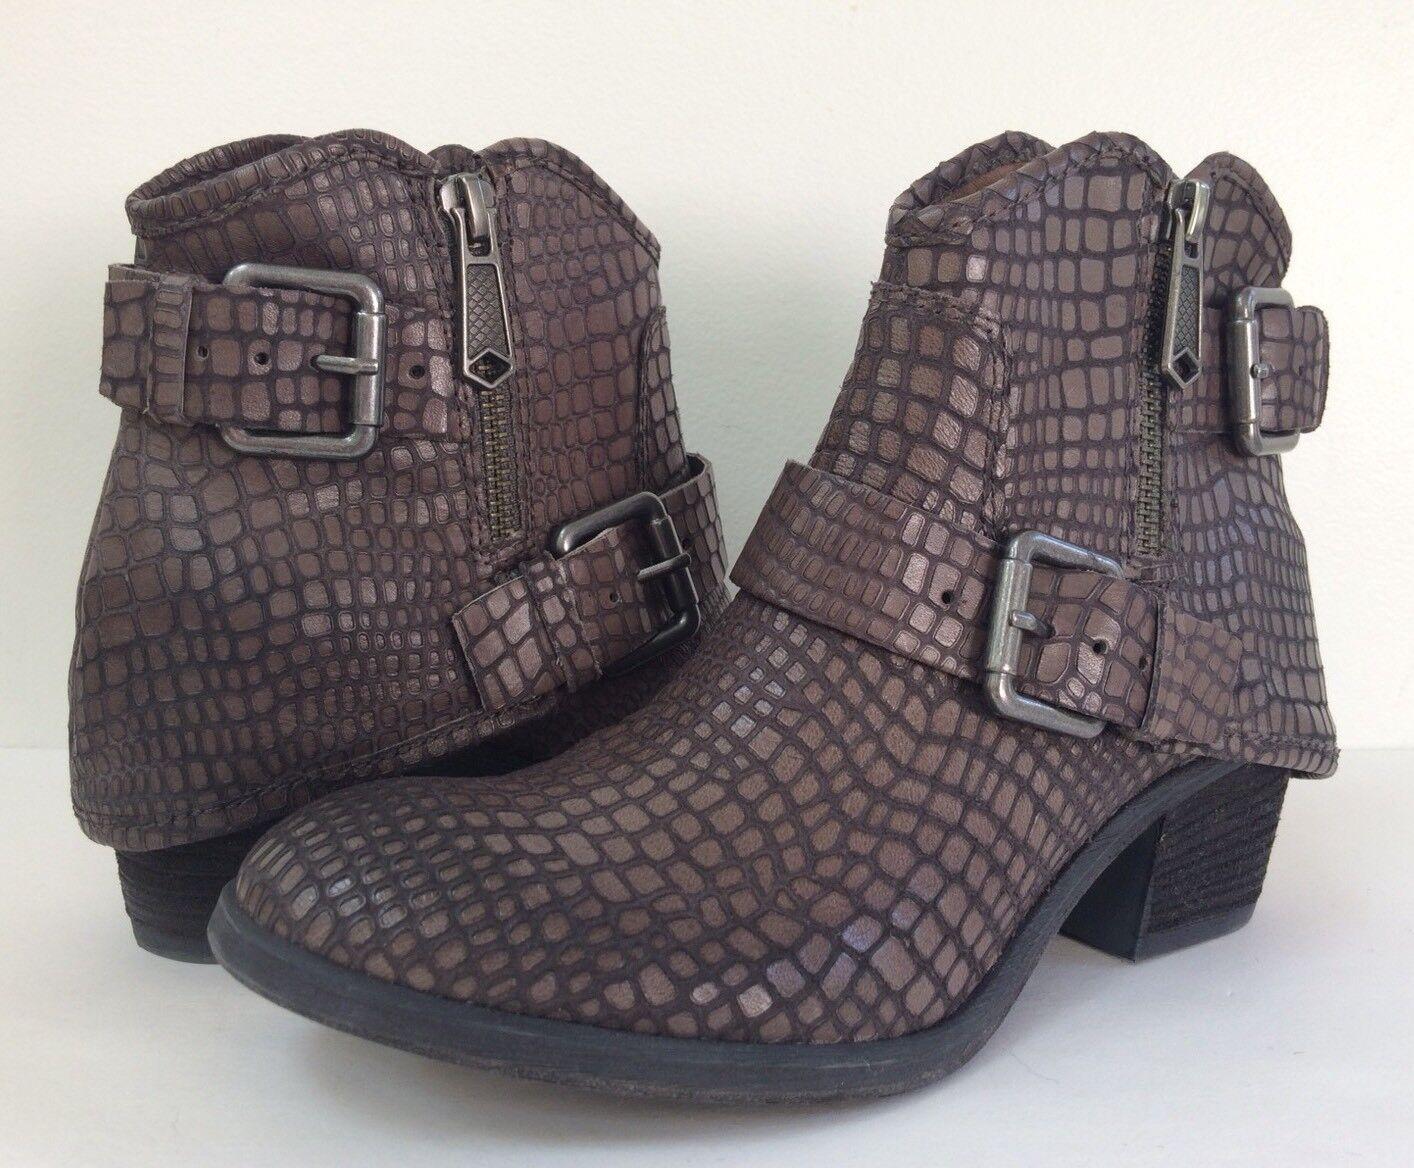 New Donald Pliner 5.5M Dalis Vintage Python Ankle Riding Charcoal stivali avvioies